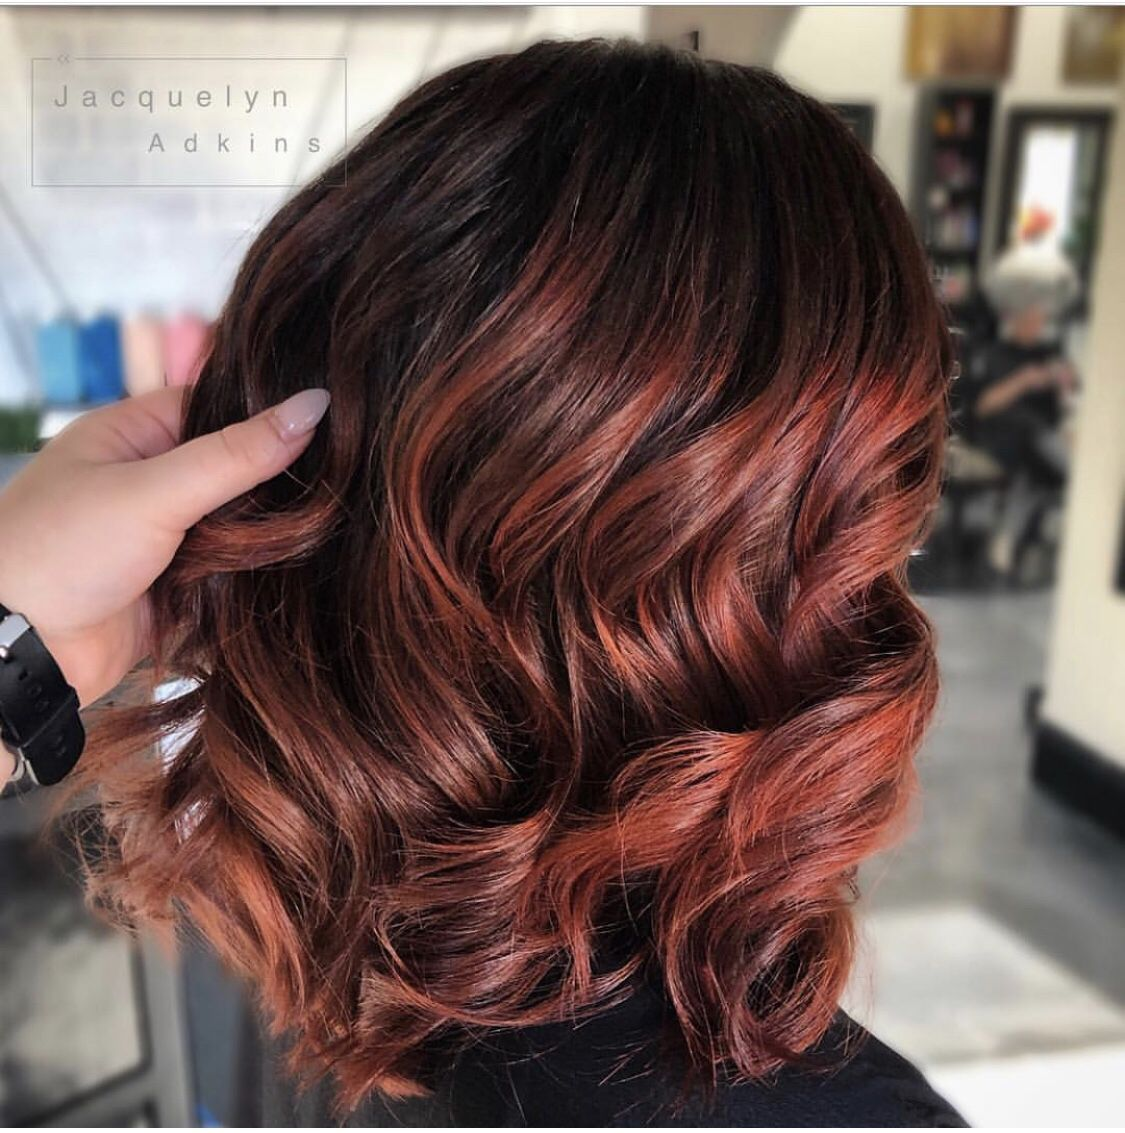 Follow Me On Instagram Unevneib Red Hair Short Red Hair Wavy Hair Curly Hair Wand Curls Hand Painted Hair Balayage D Maroon Hair Short Red Hair Red Curly Hair